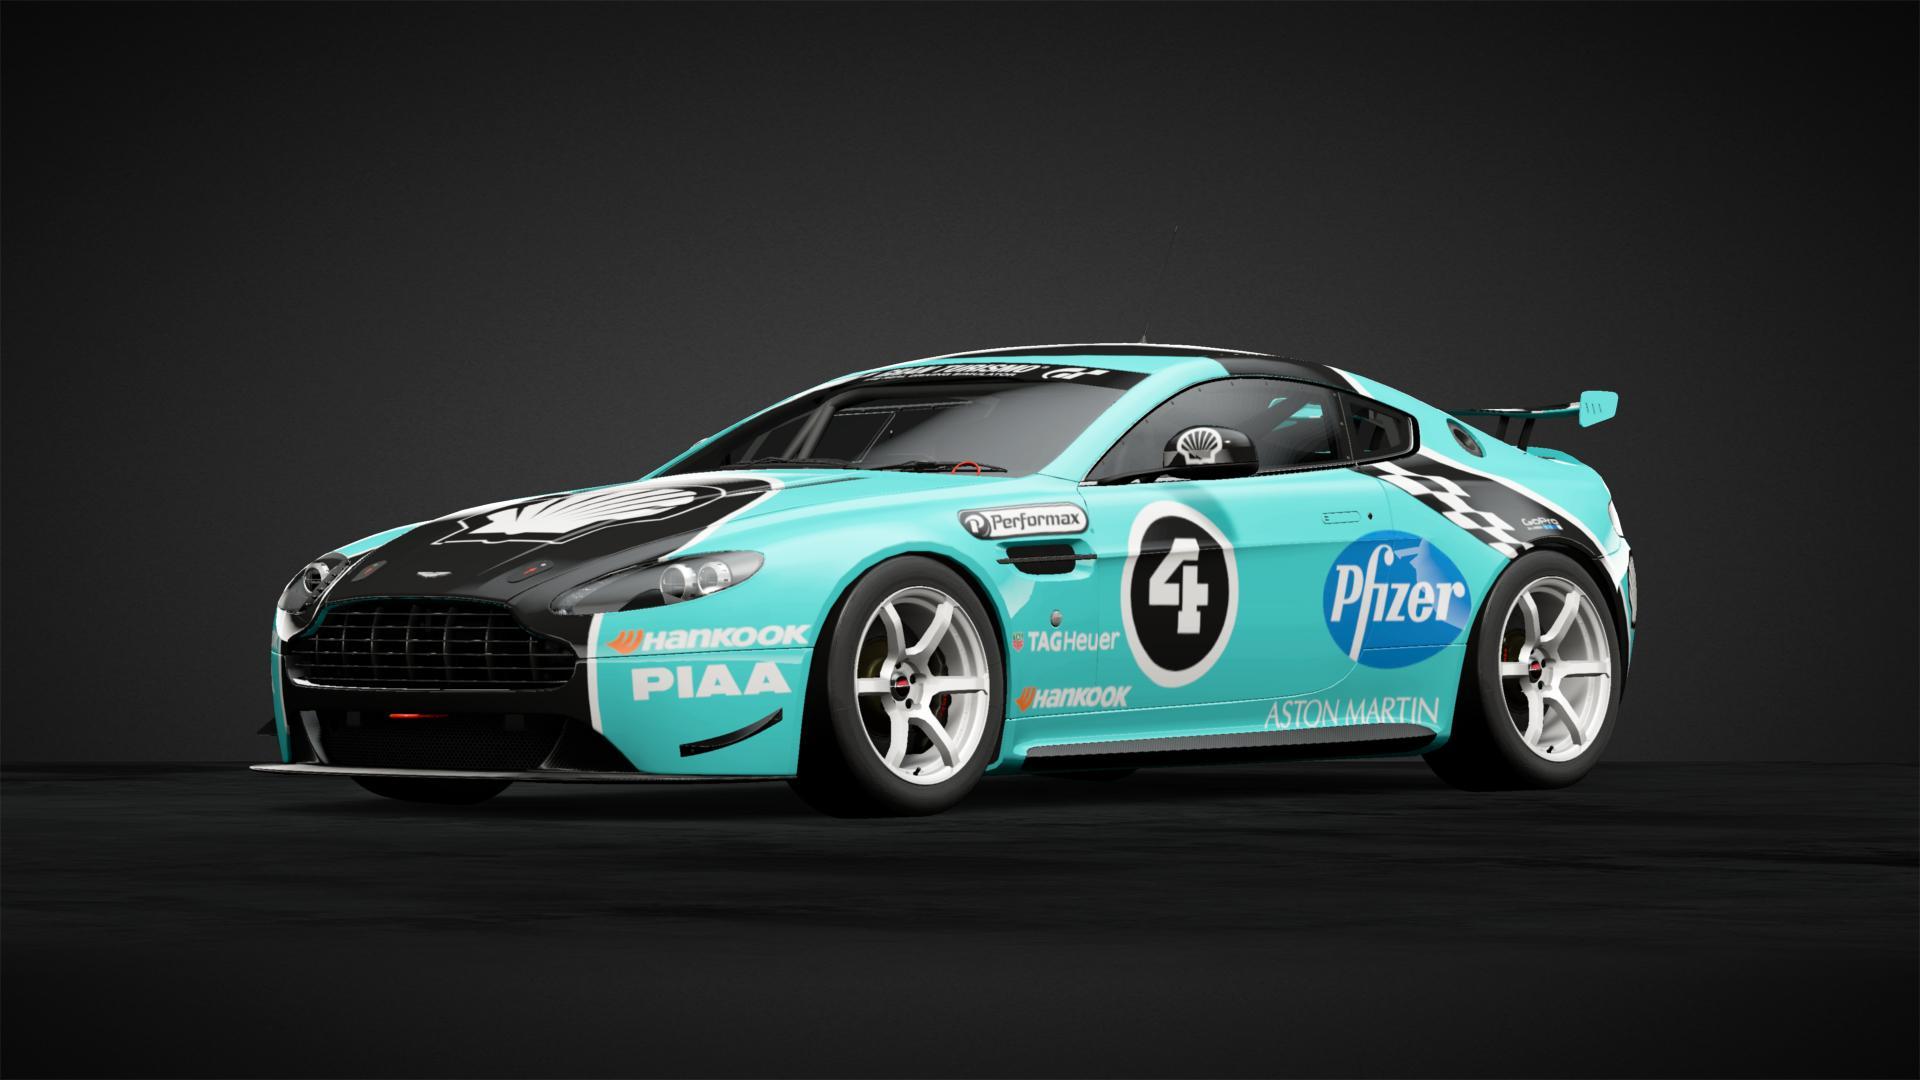 Aston Martin Shell 4 racer Livrea vettura di Balacus